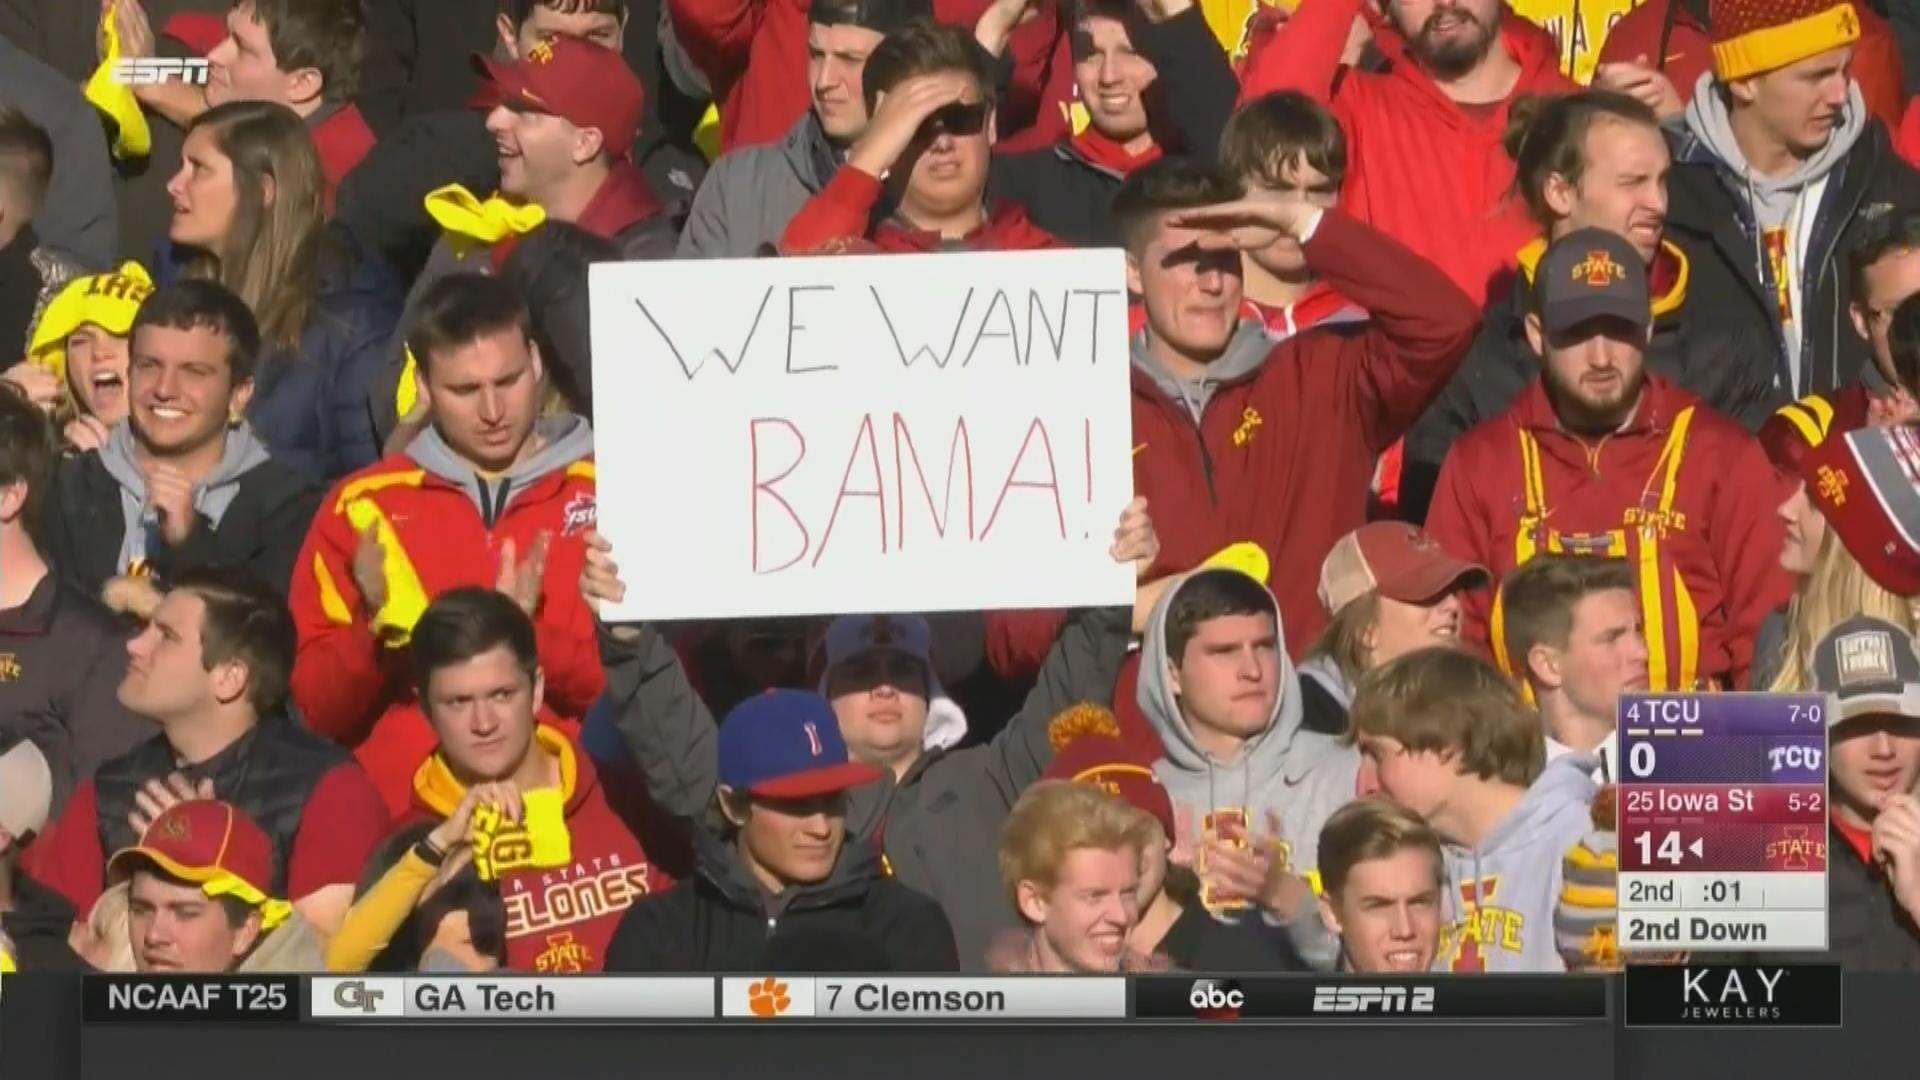 20171028160844 college football's 'we want bama' signs meme, explained sbnation com